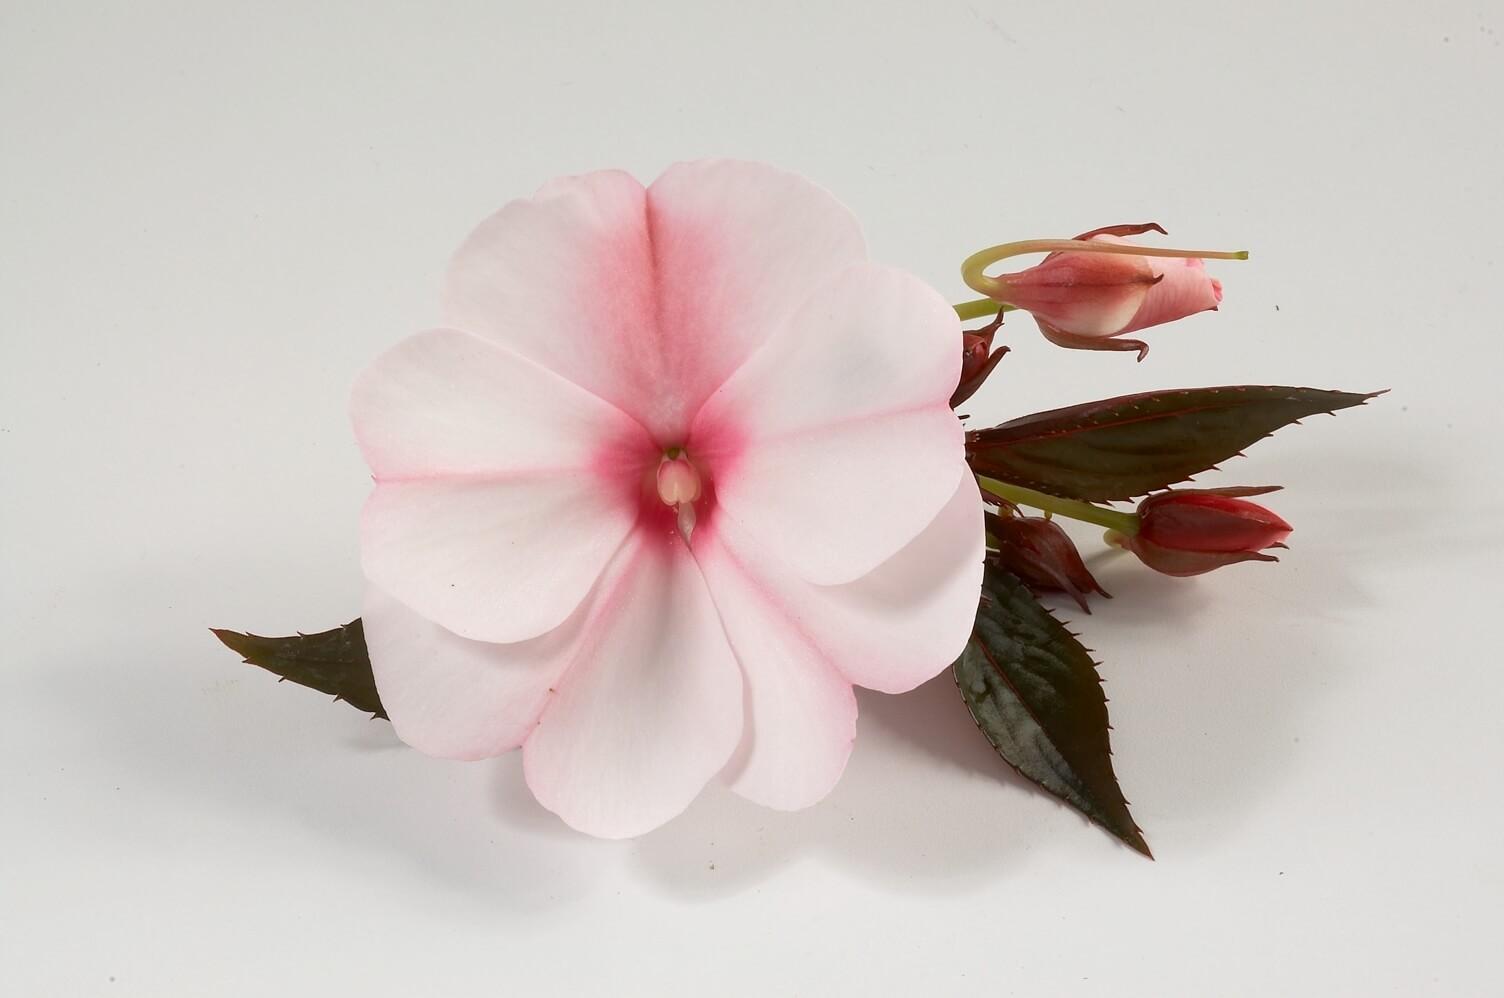 Picture of Live New Guinea Impatiens Candy Cream aka Impatiens hawkeri 'Harmony Candy Cream' Plant Fit 1QRT Pot